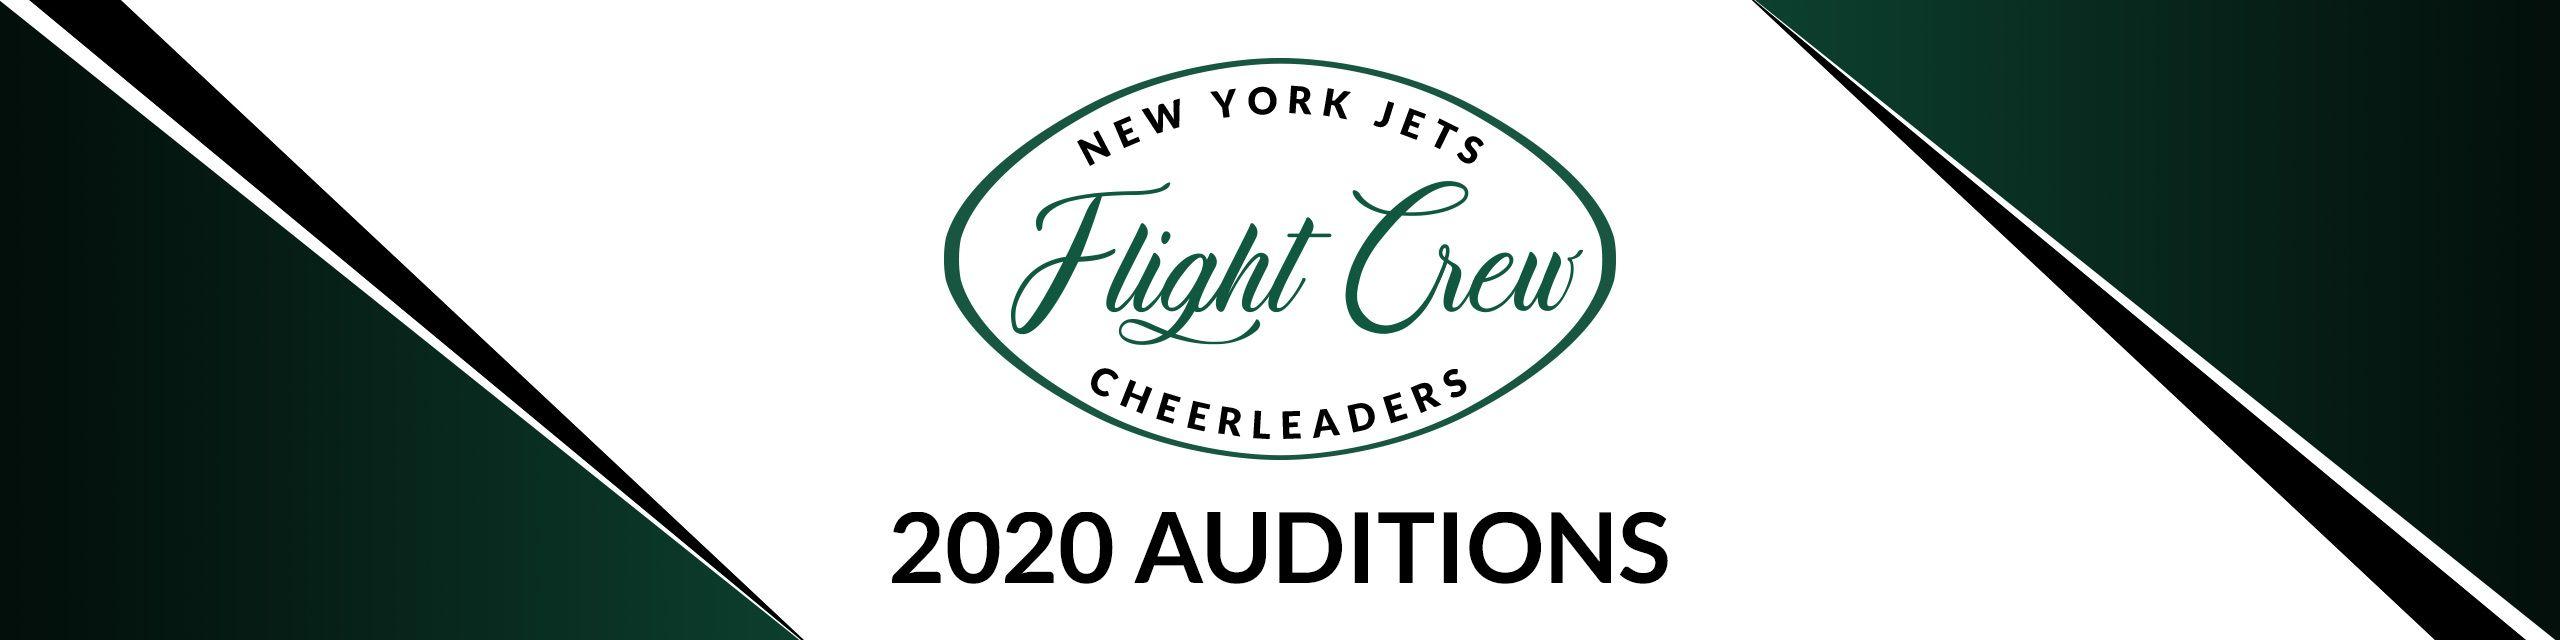 FlightCrew-Auditions-header